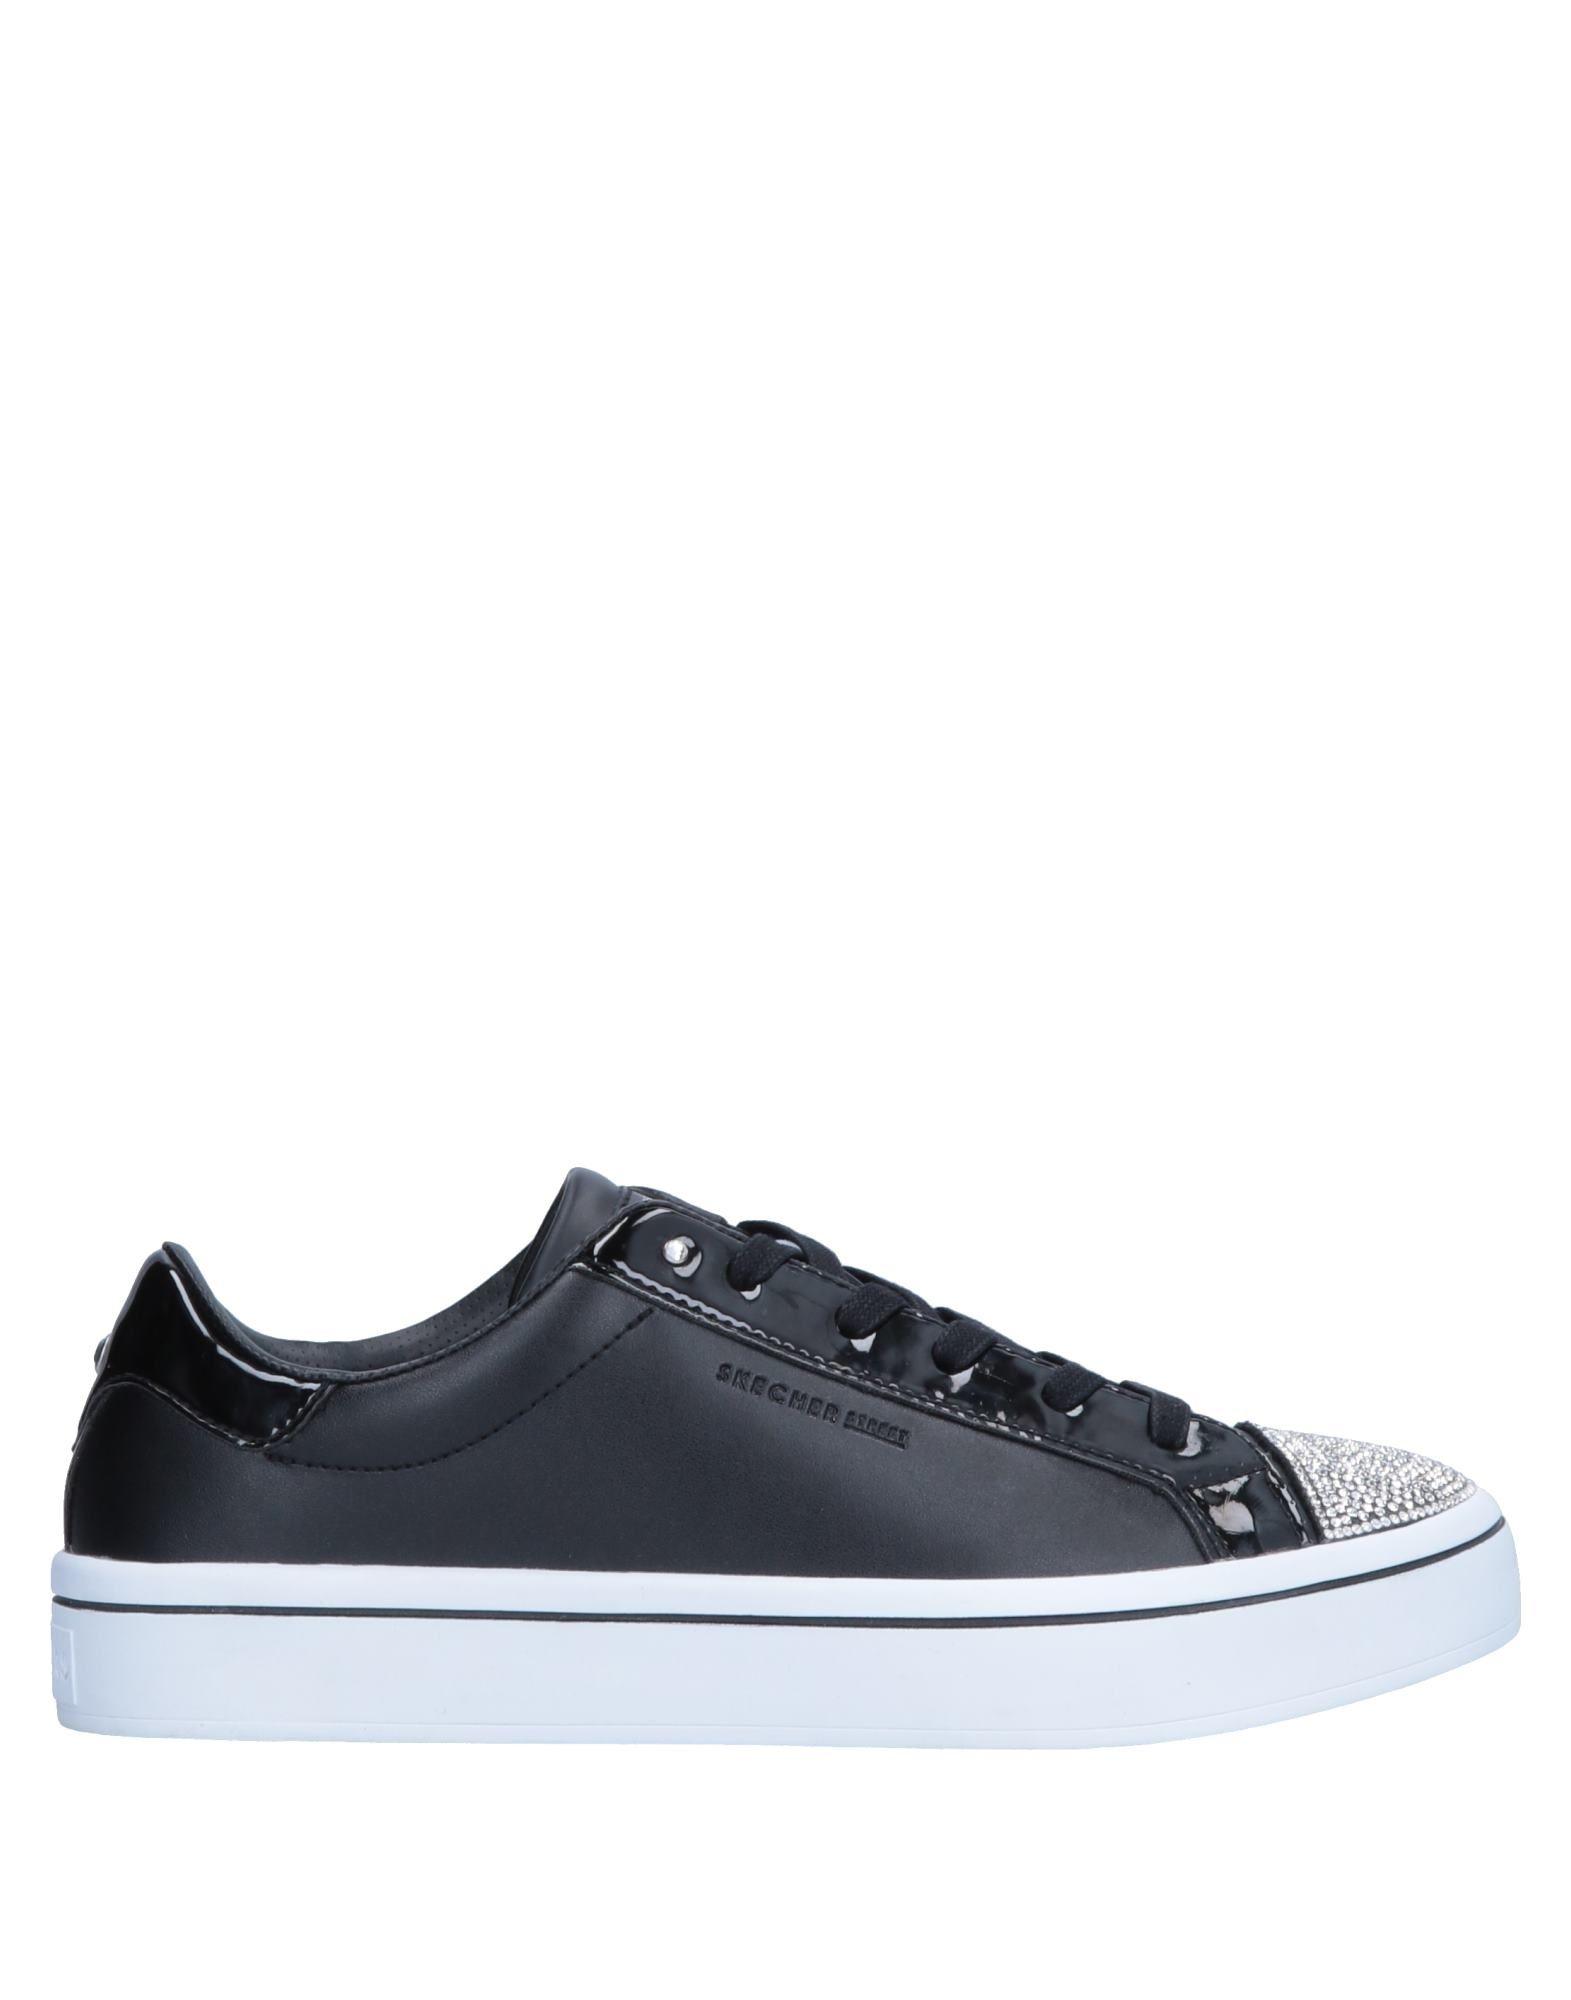 Skechers Sneakers Damen  11557466TU Gute Qualität beliebte Schuhe